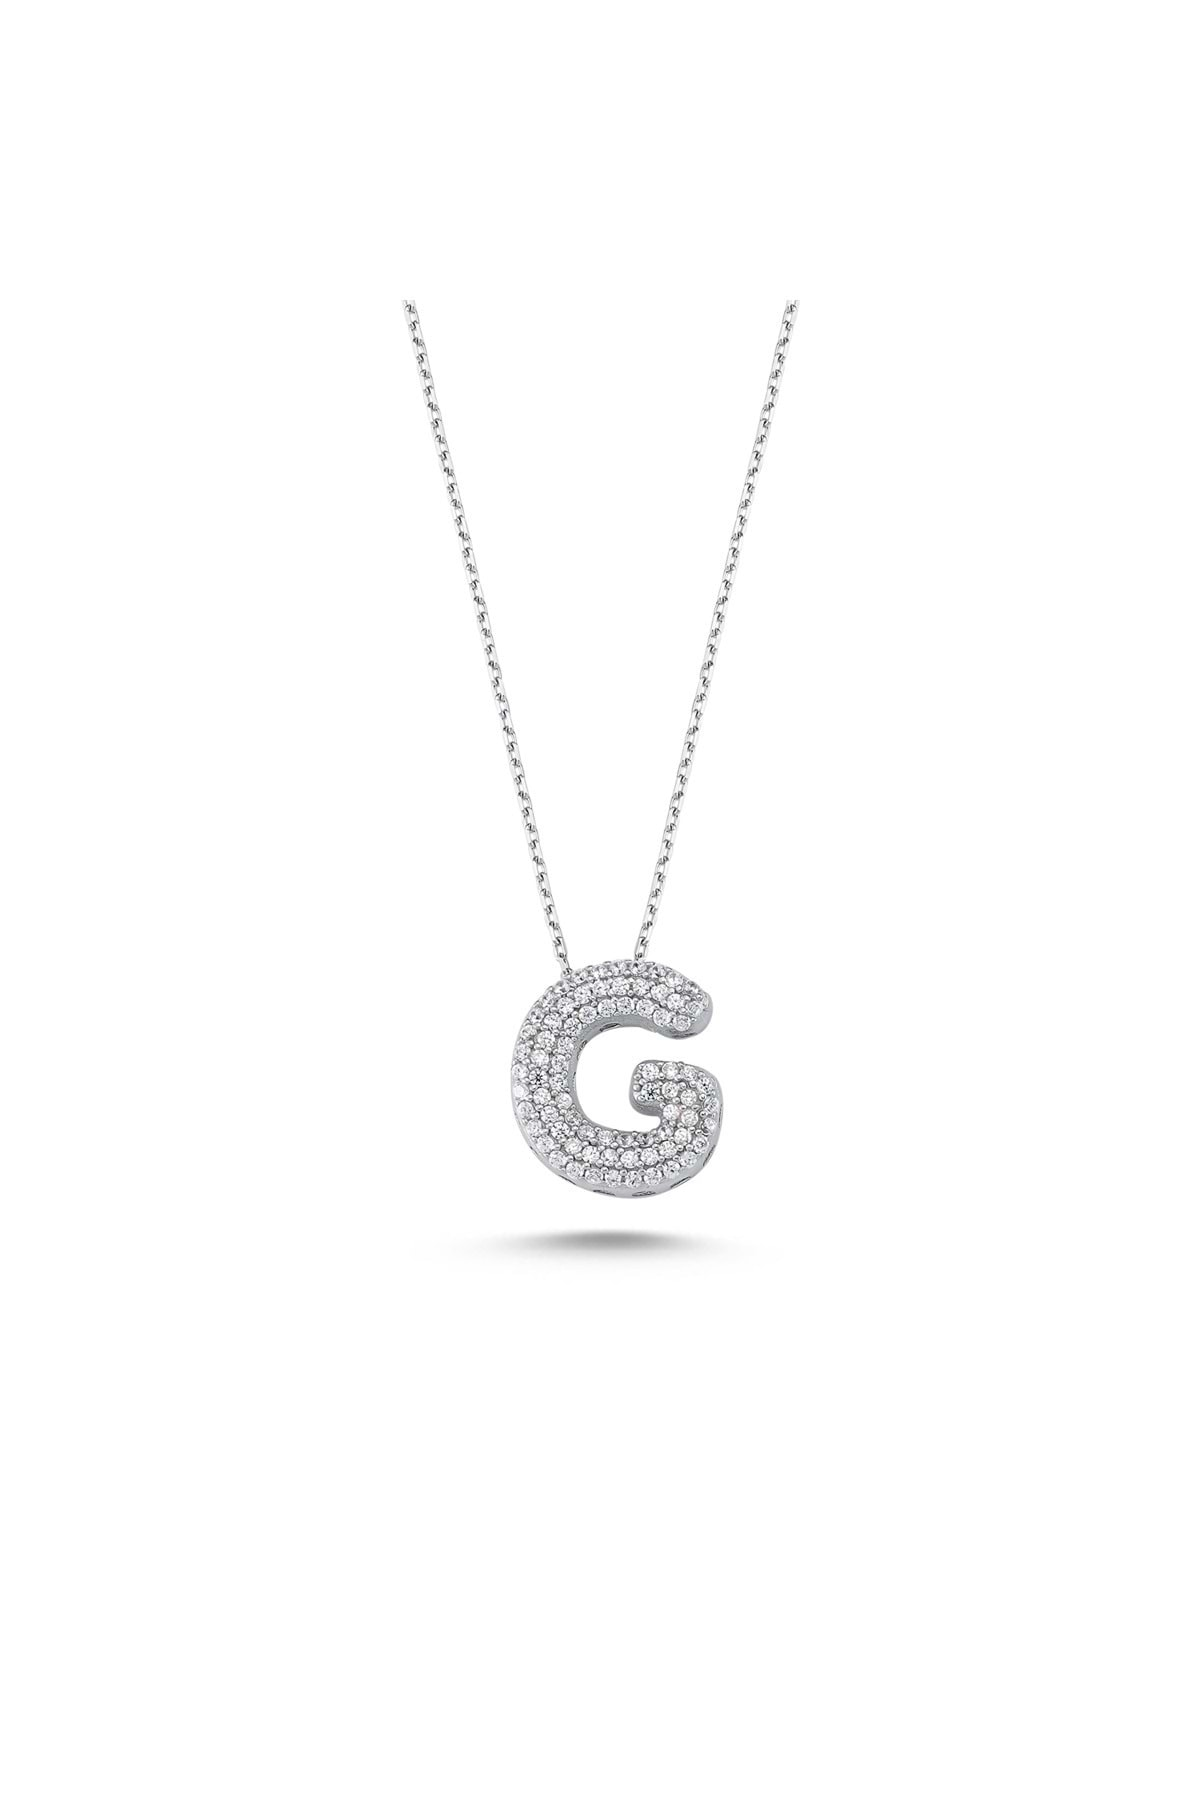 925 Ayar Gümüş Taşlı Harfli Kolye- G Harfi - Standart - Ada002-1756